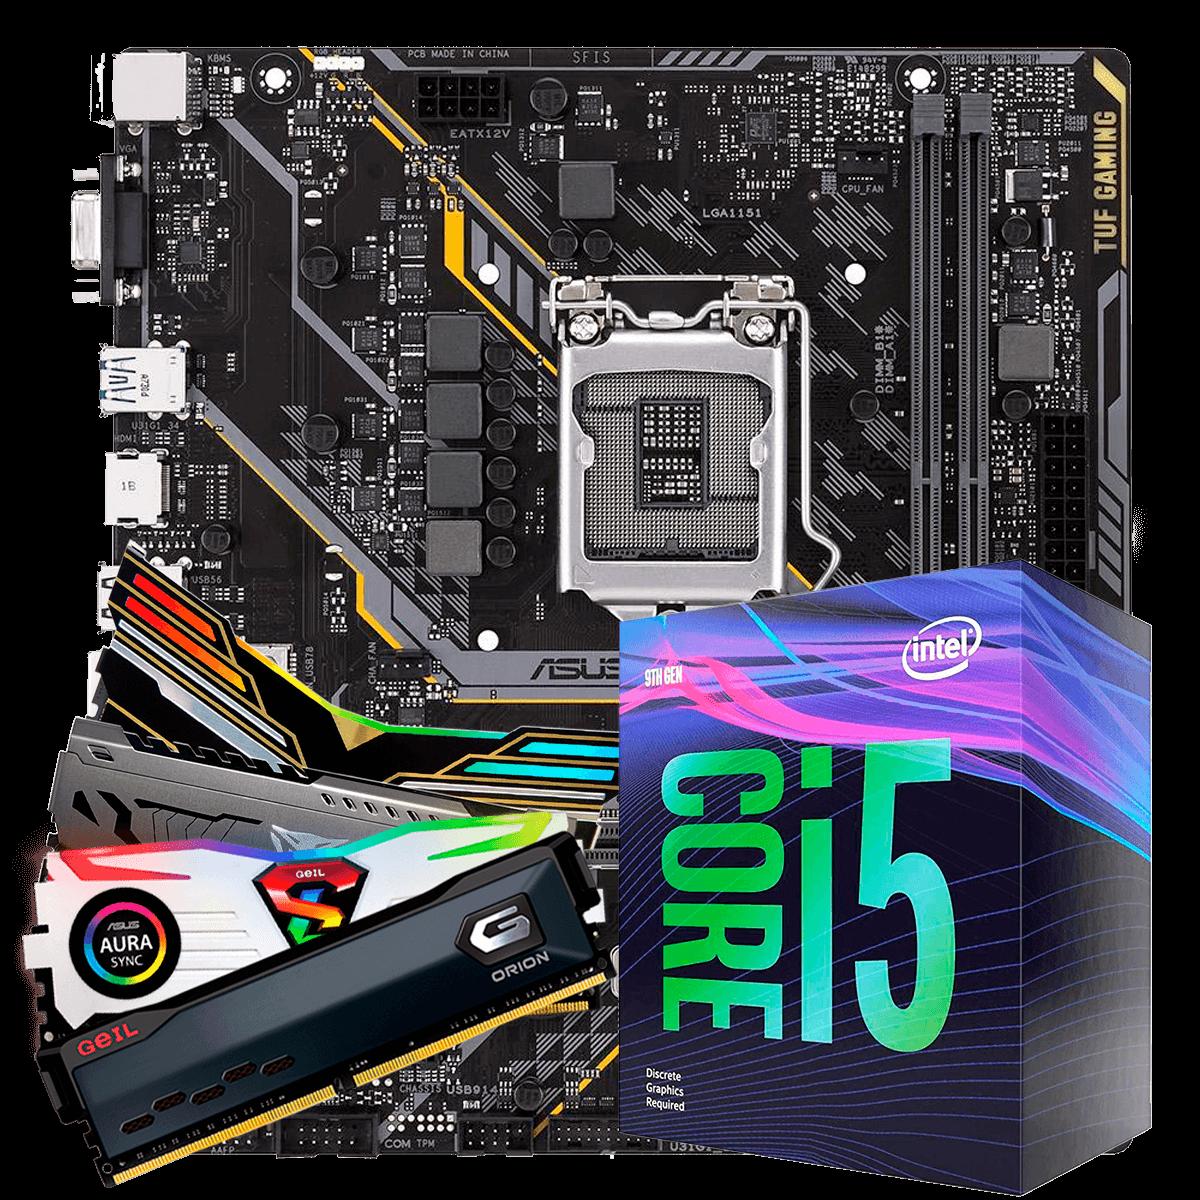 Kit Upgrade, Intel Core i5 9400F, Asus TUF H310M-Plus Gaming, Memória DDR4 16GB (2x8GB) 3000MHz